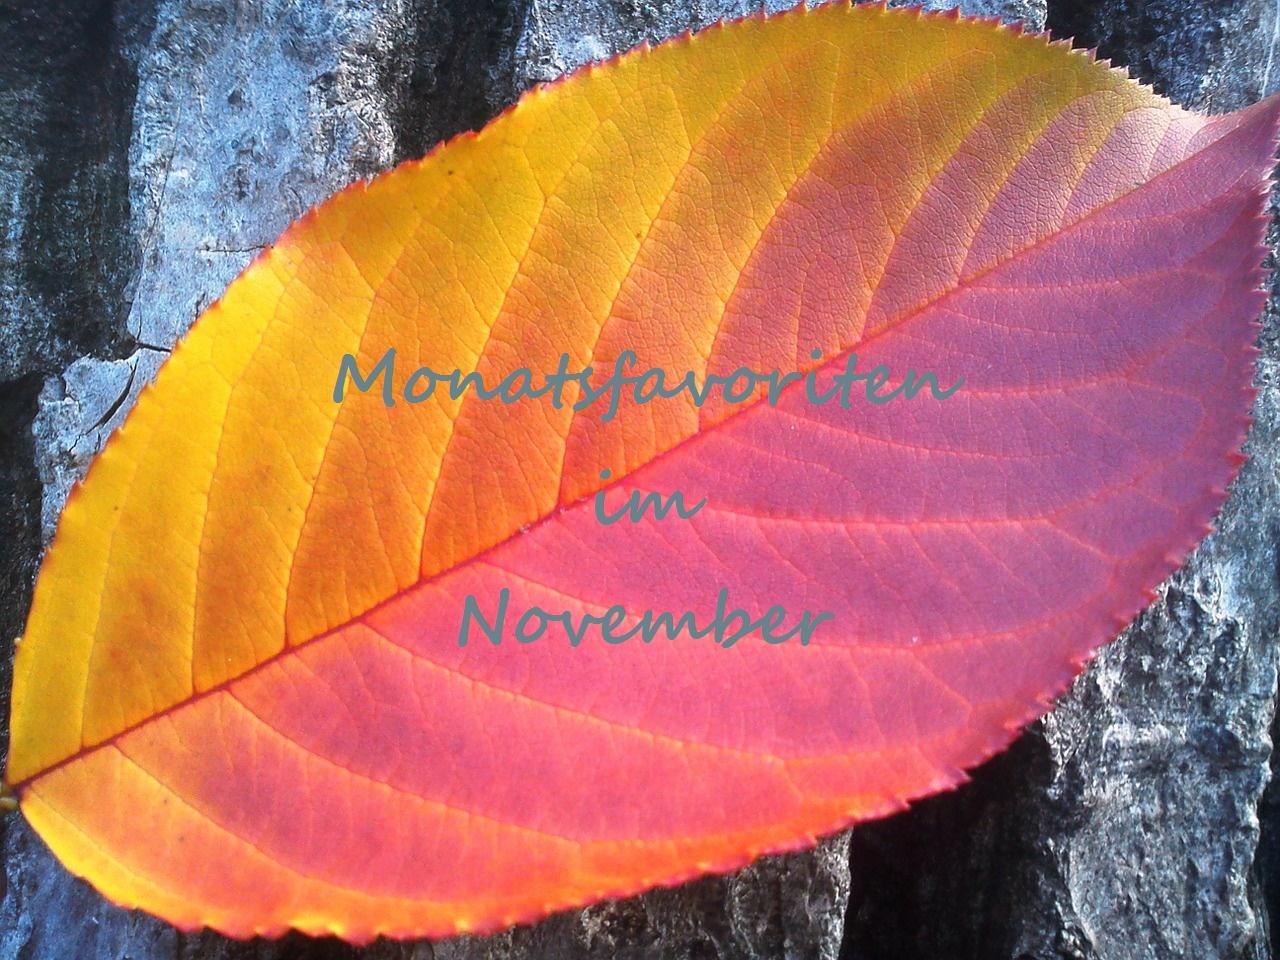 monatsfavoriten_november_header_2016